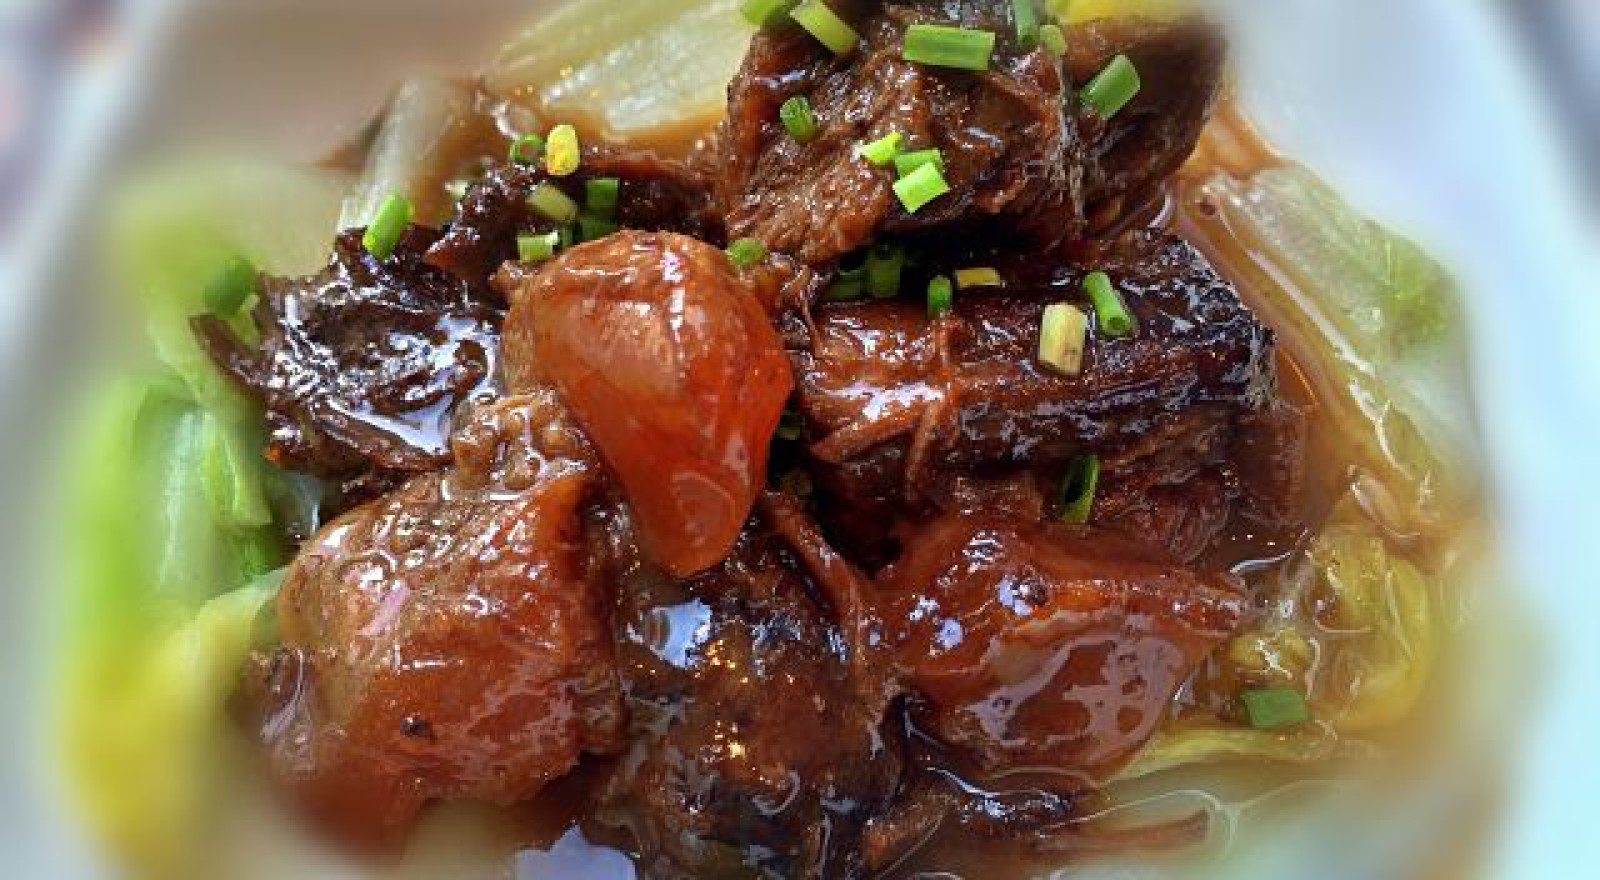 yumchee-beef-brisket-rice-coffeehan